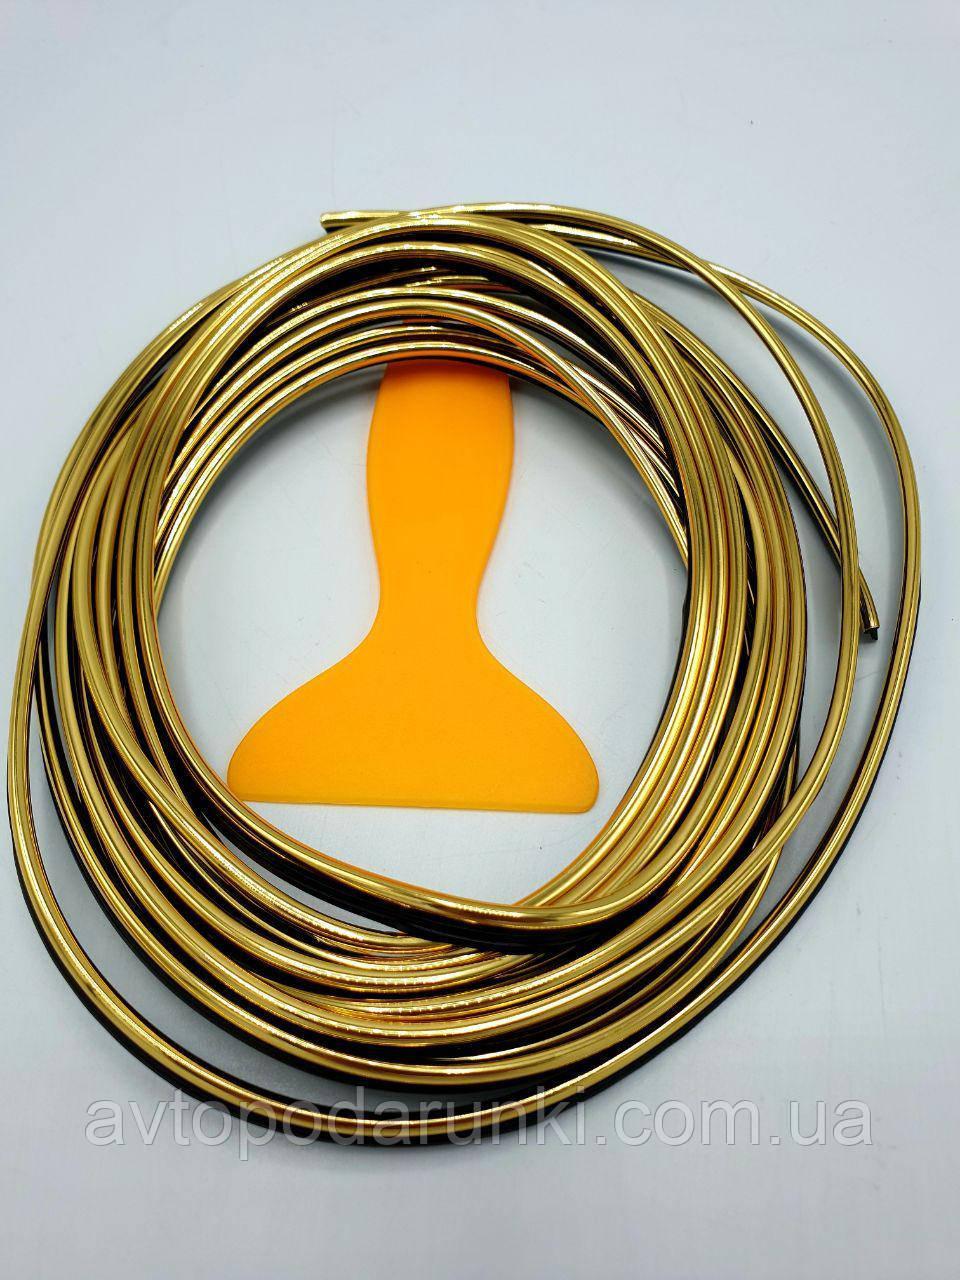 Стайлинг молдинг 3D лента для декора салона авто / Золото / 5м